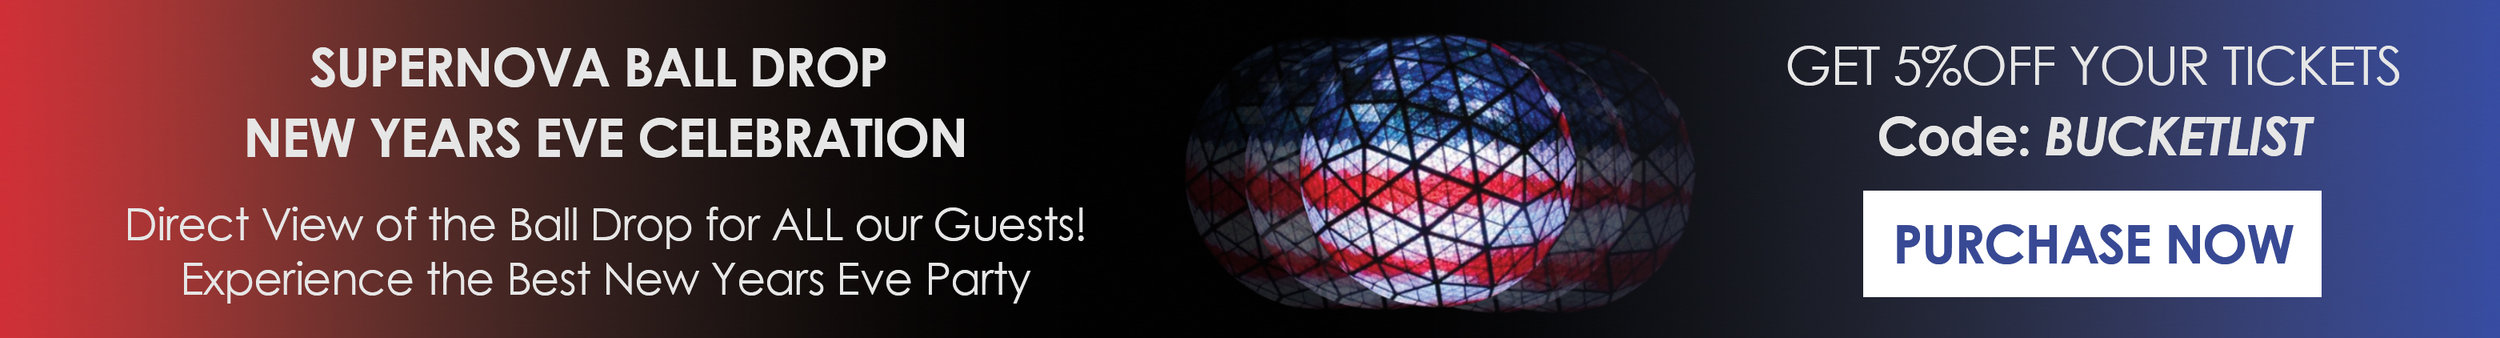 SuperNova Ball Drop - NYE in TImes Square.jpg